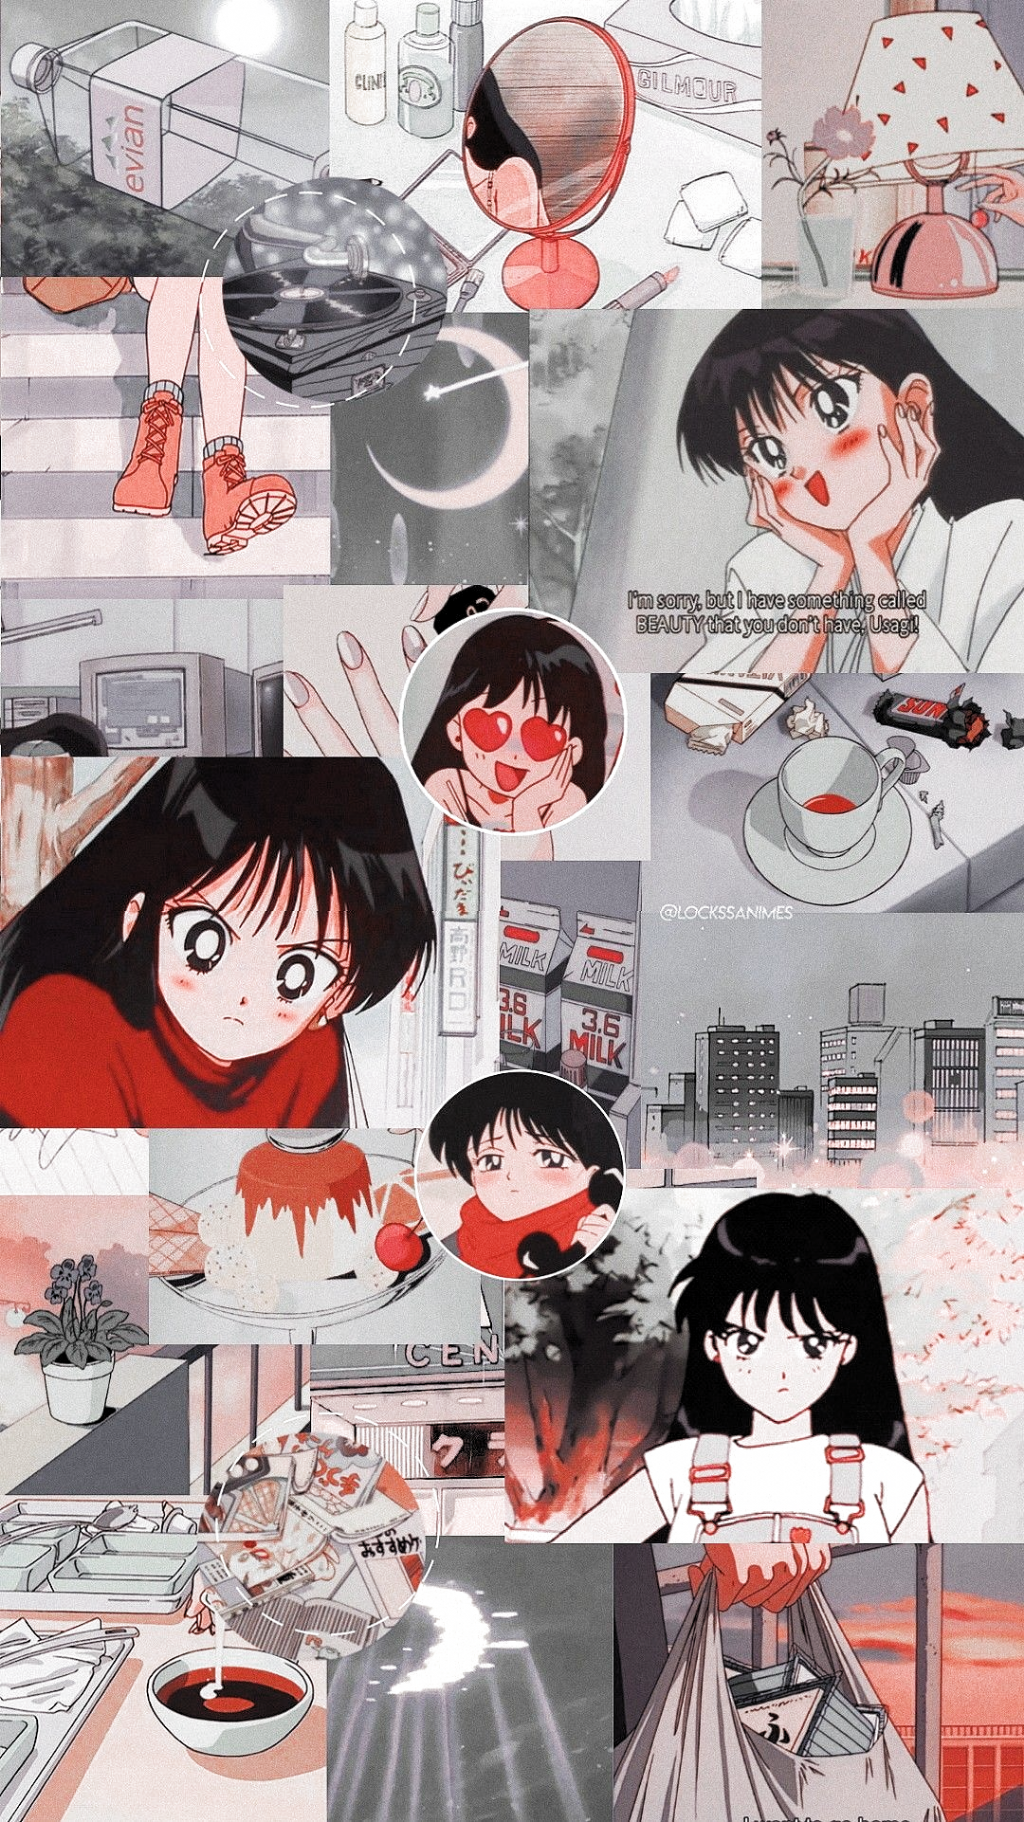 List Of Best Aesthetic Anime Wallpaper Iphone Rei Hino Aestheticanimewallpaperiphone Aesthetic Anime Anime Wallpaper Anime Wallpaper Iphone